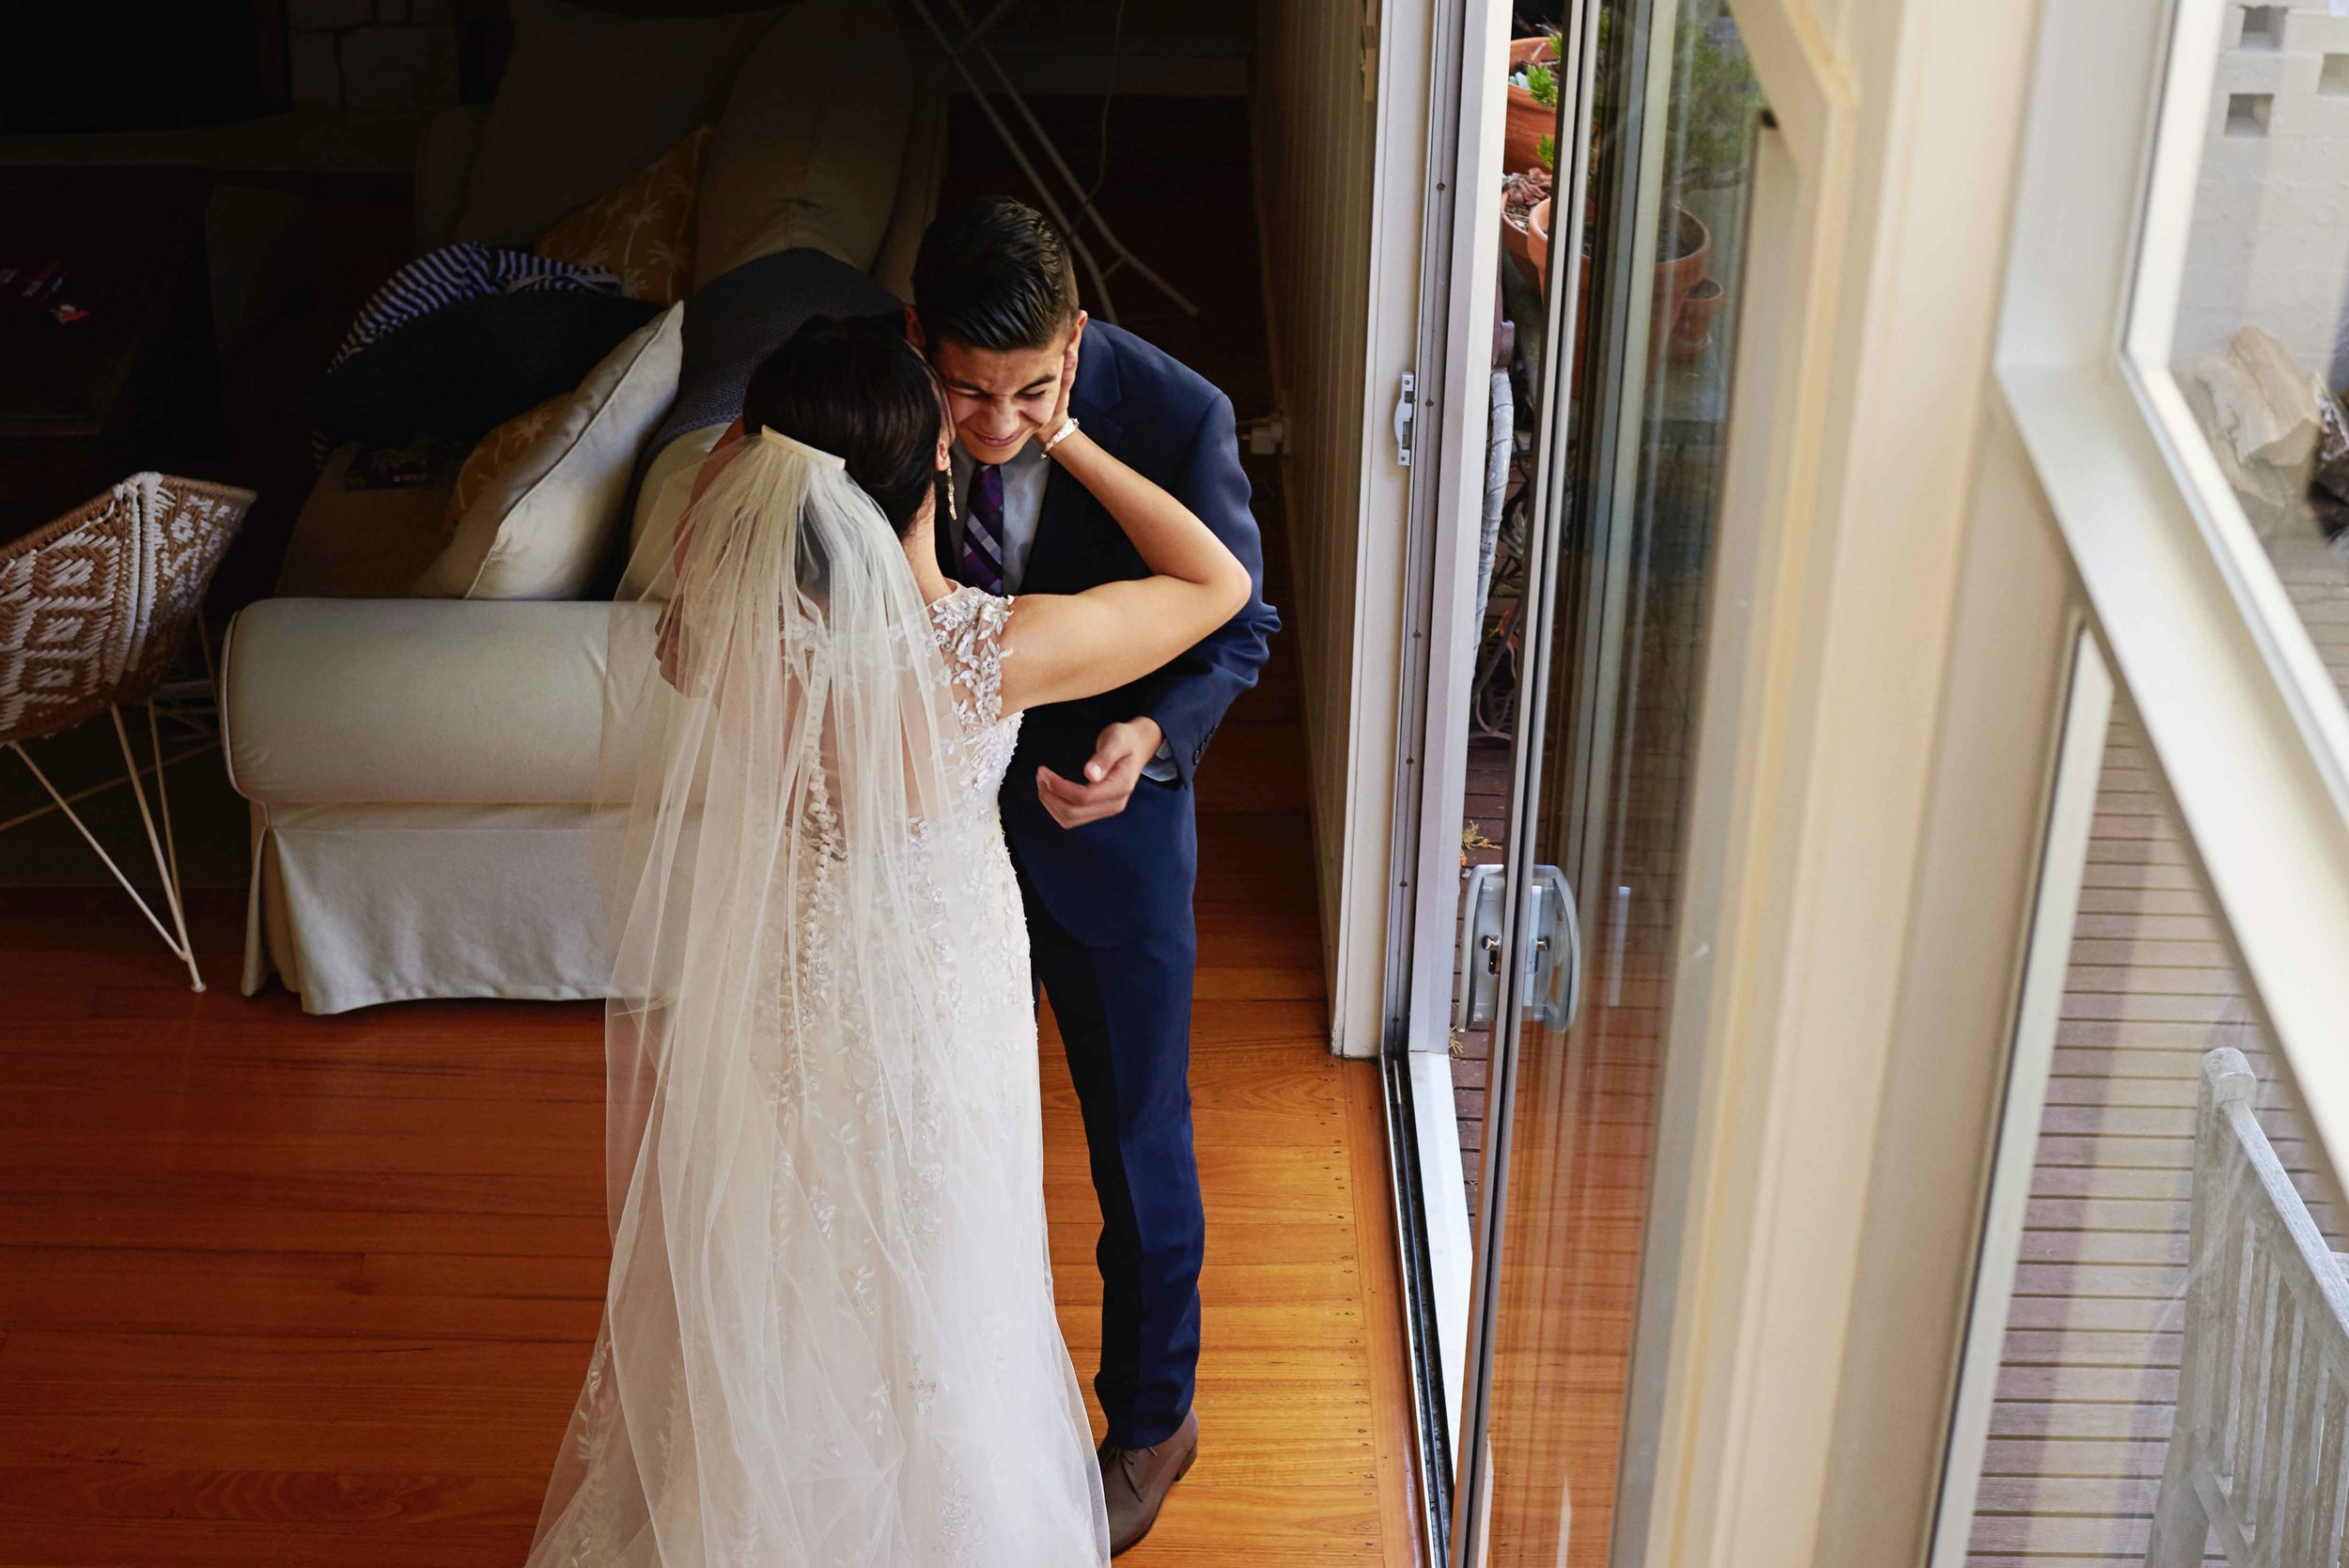 sorrento-wedding-photography-all-smiles-marissa-jade-photography-30.jpg